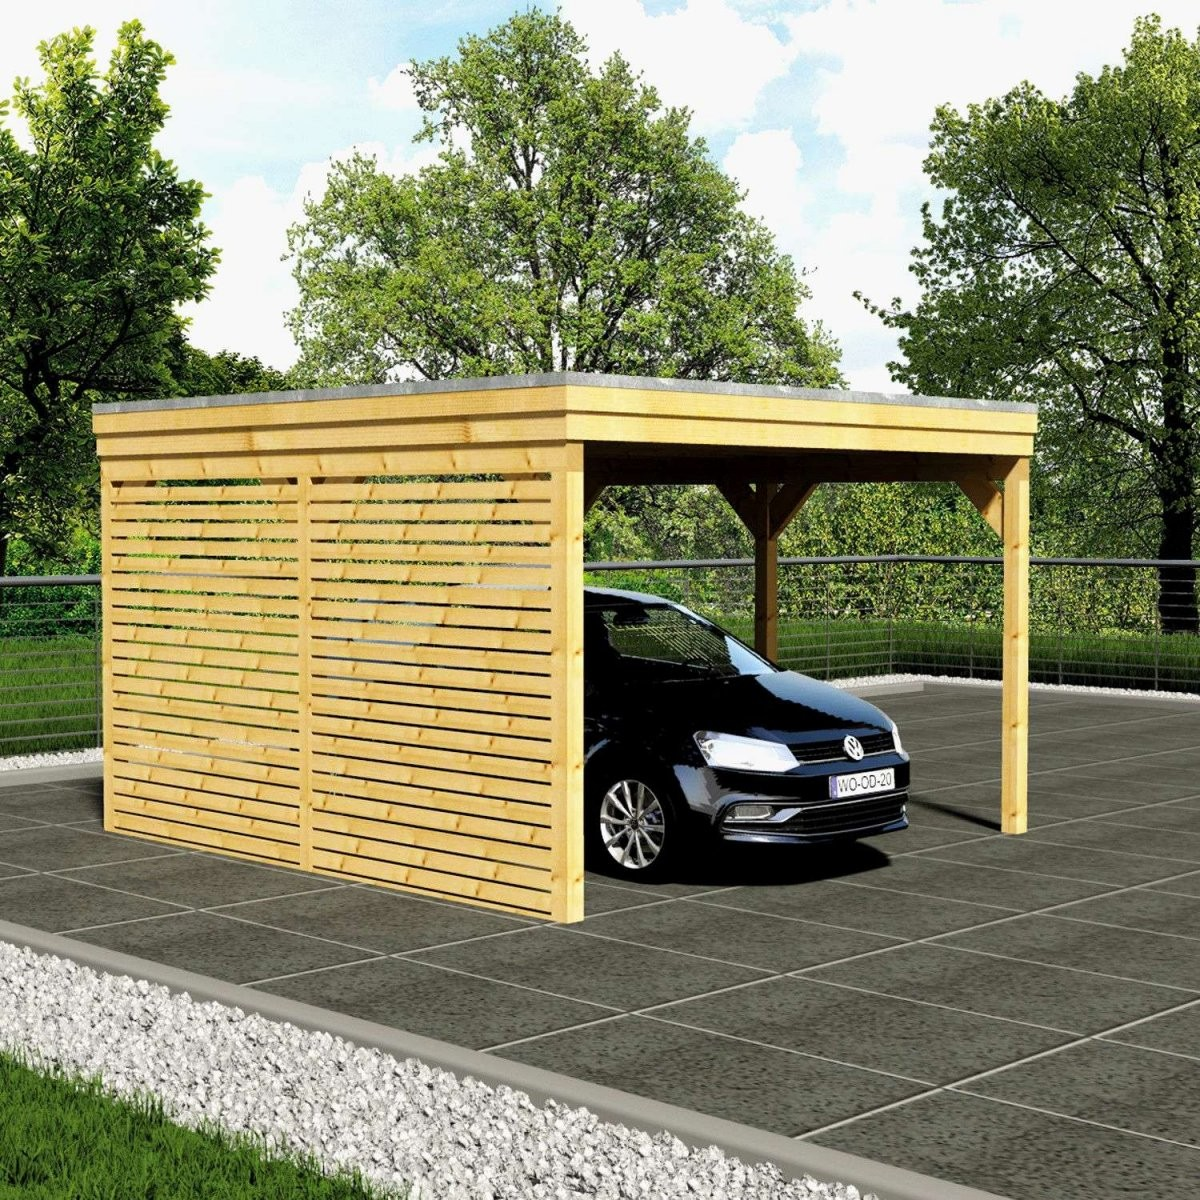 Pavillon Garten Holz Frisch Pavillon Holz Selber Bauen Konzept Holz von Pavillon Selber Bauen Flachdach Bild